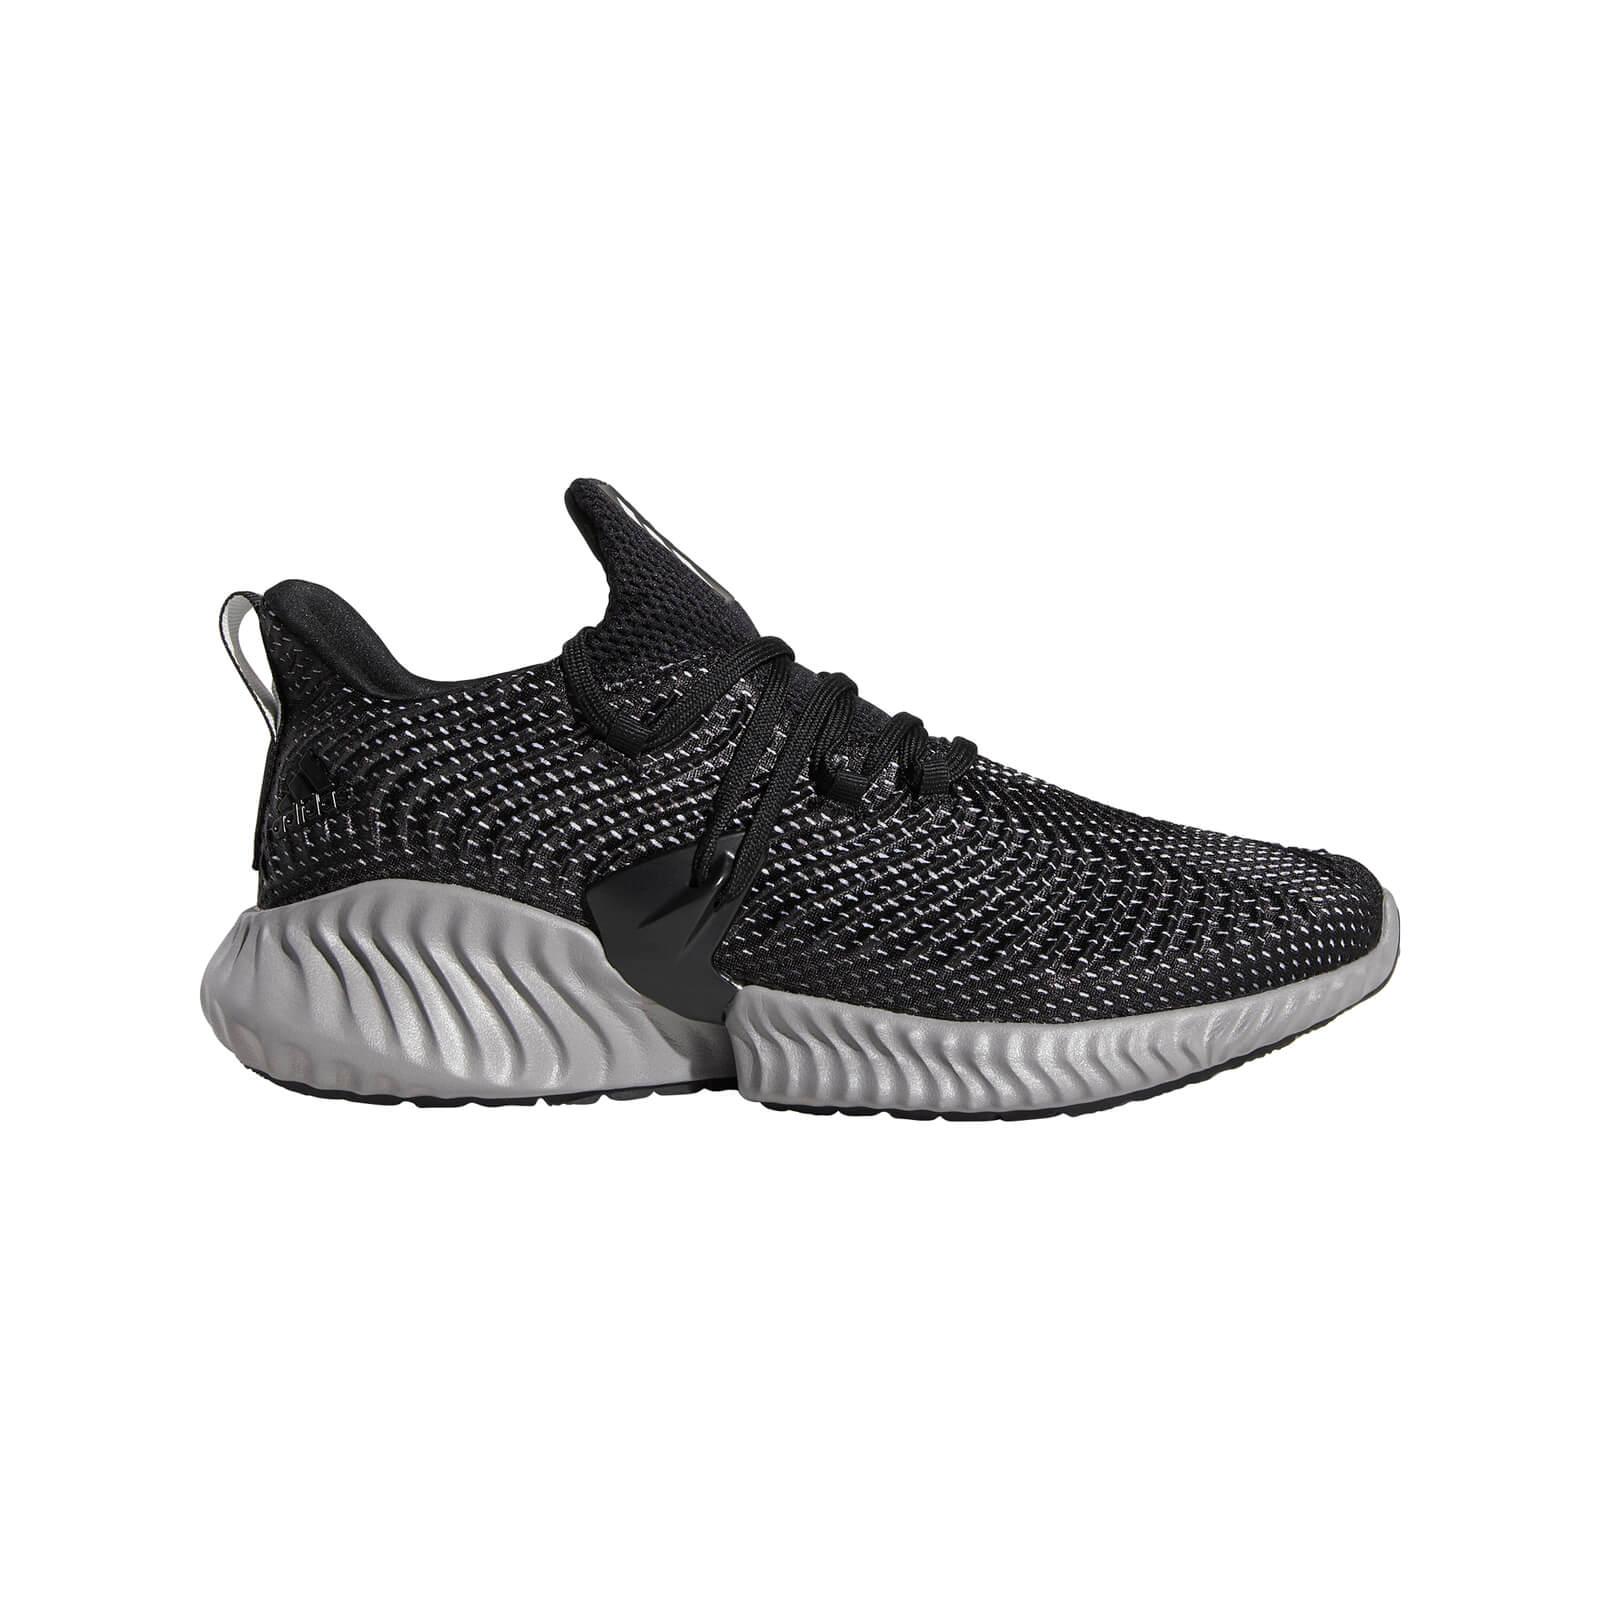 adidas Men's Alphabounce Instinct Running Shoes - Black - US 8.5/UK 8 - Black